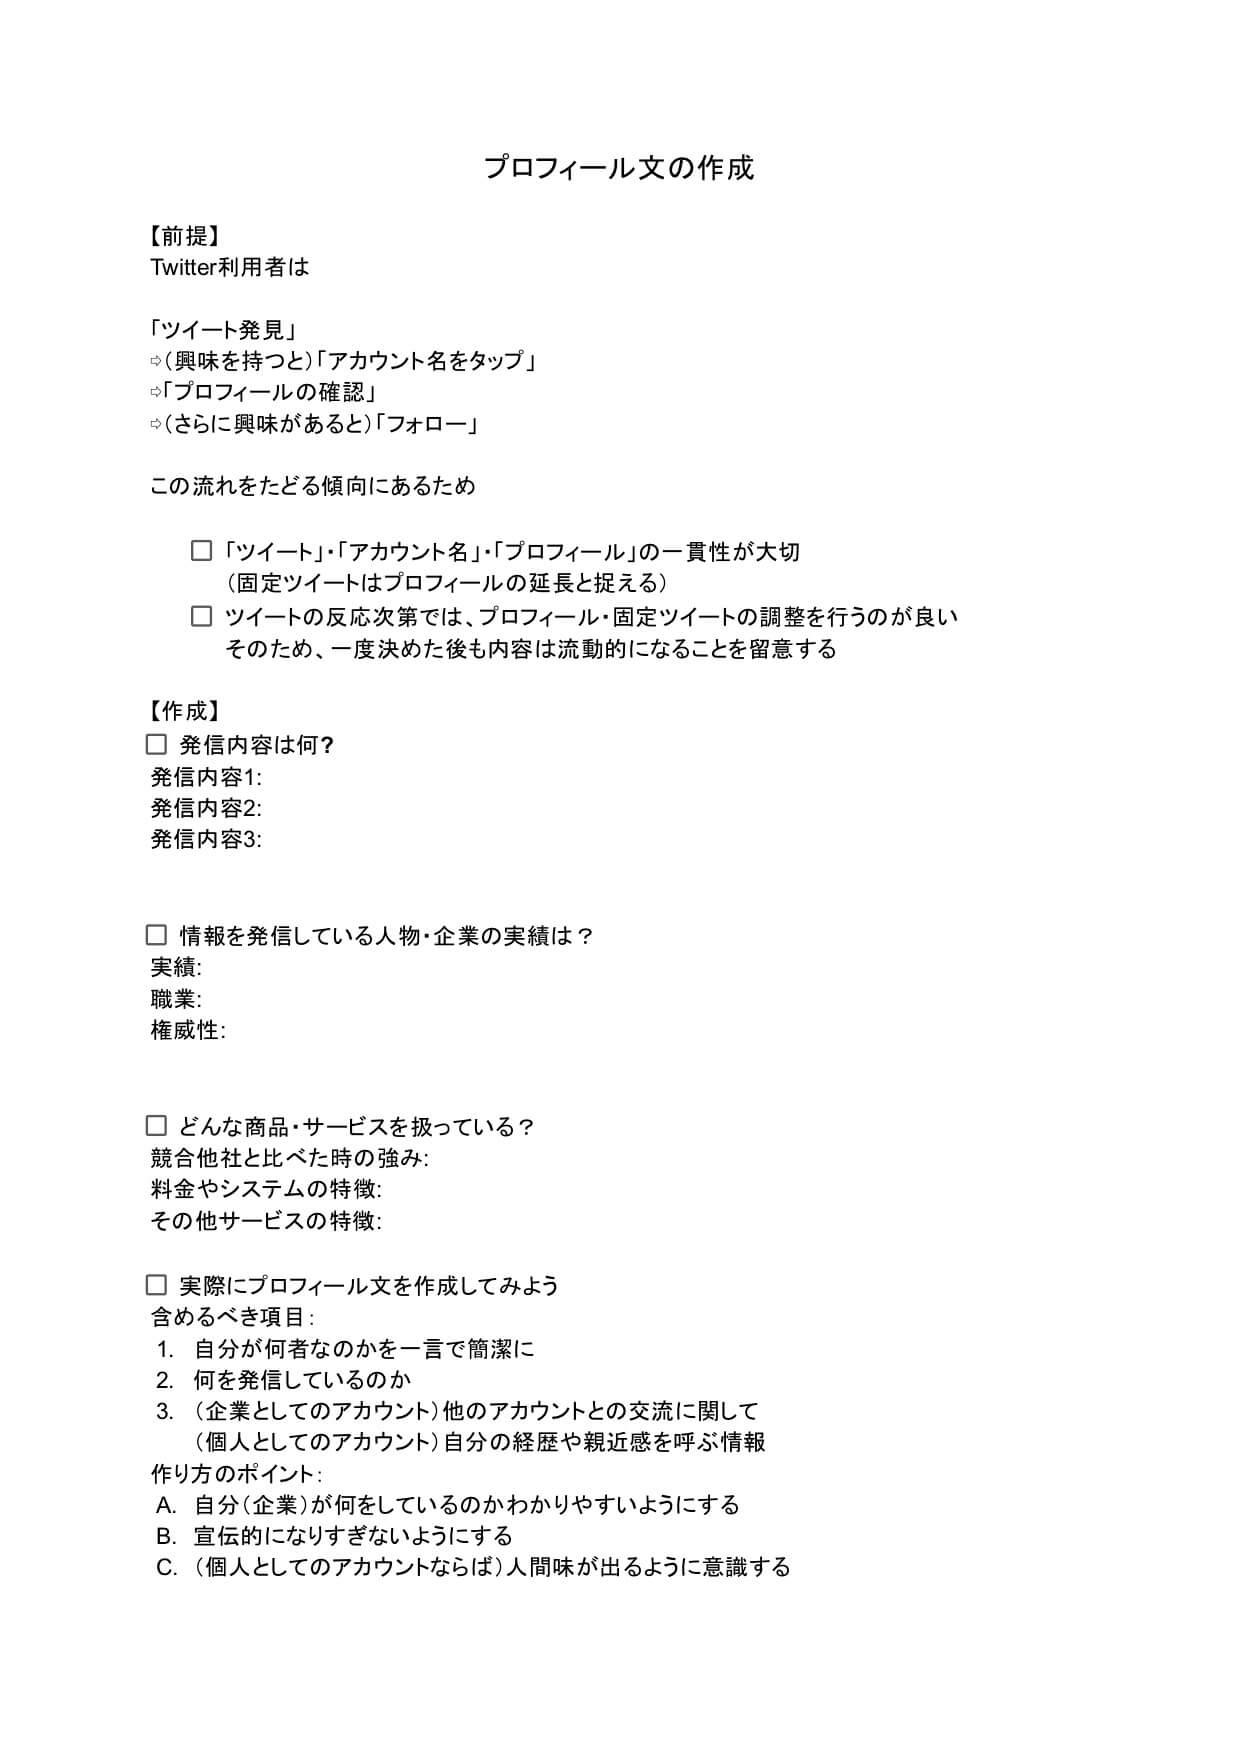 Twitterプロフィール文の作成シート1